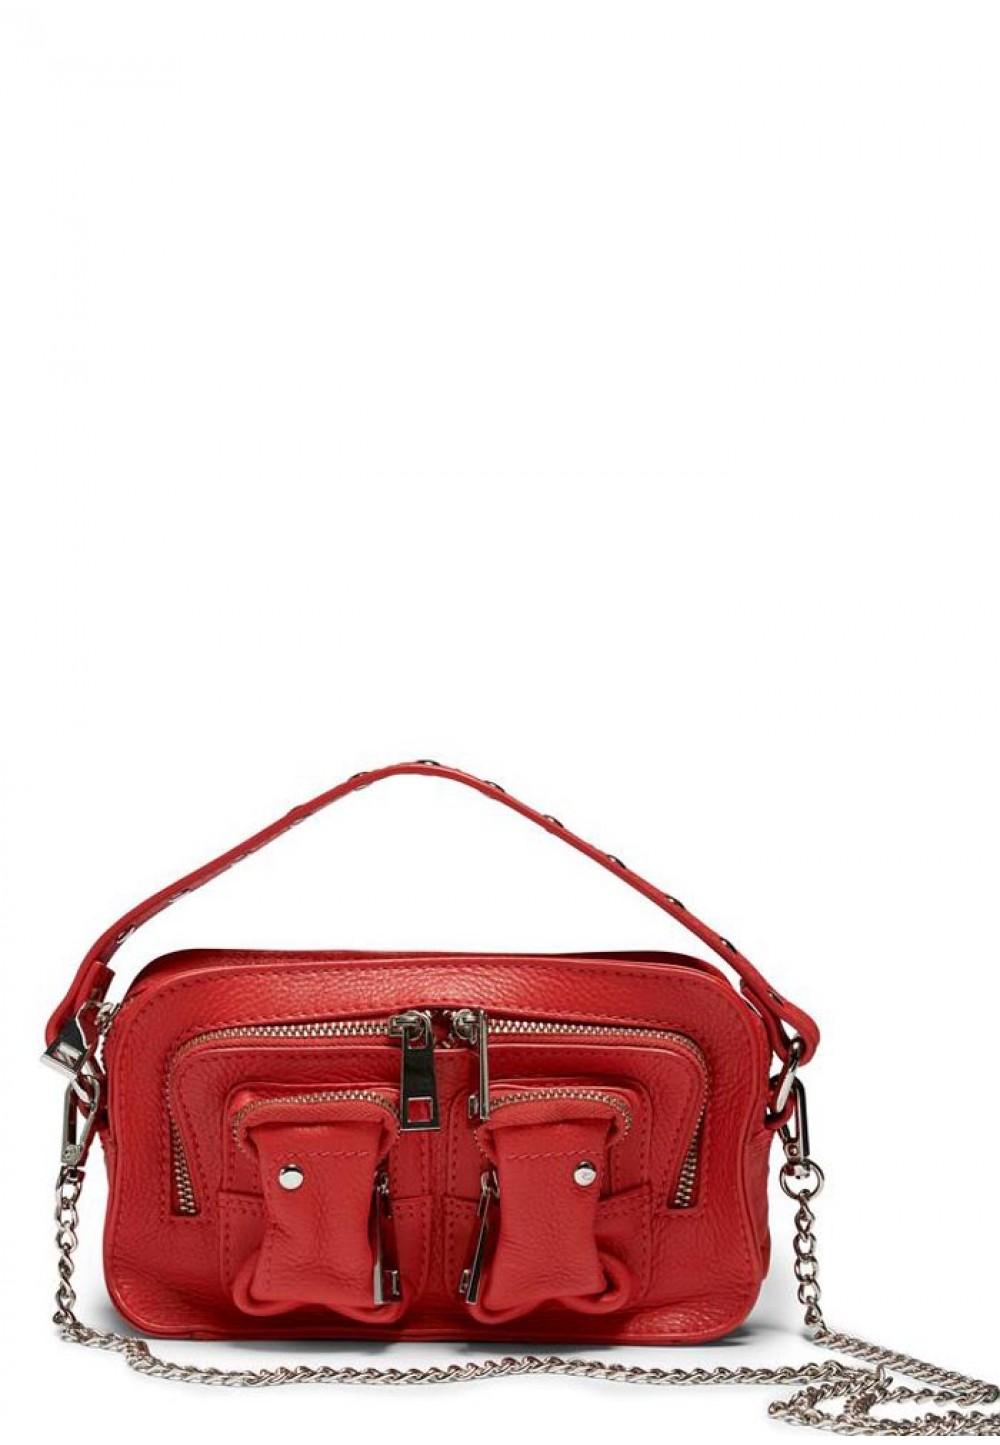 Компактна червона жіноча сумка Helena organic leather